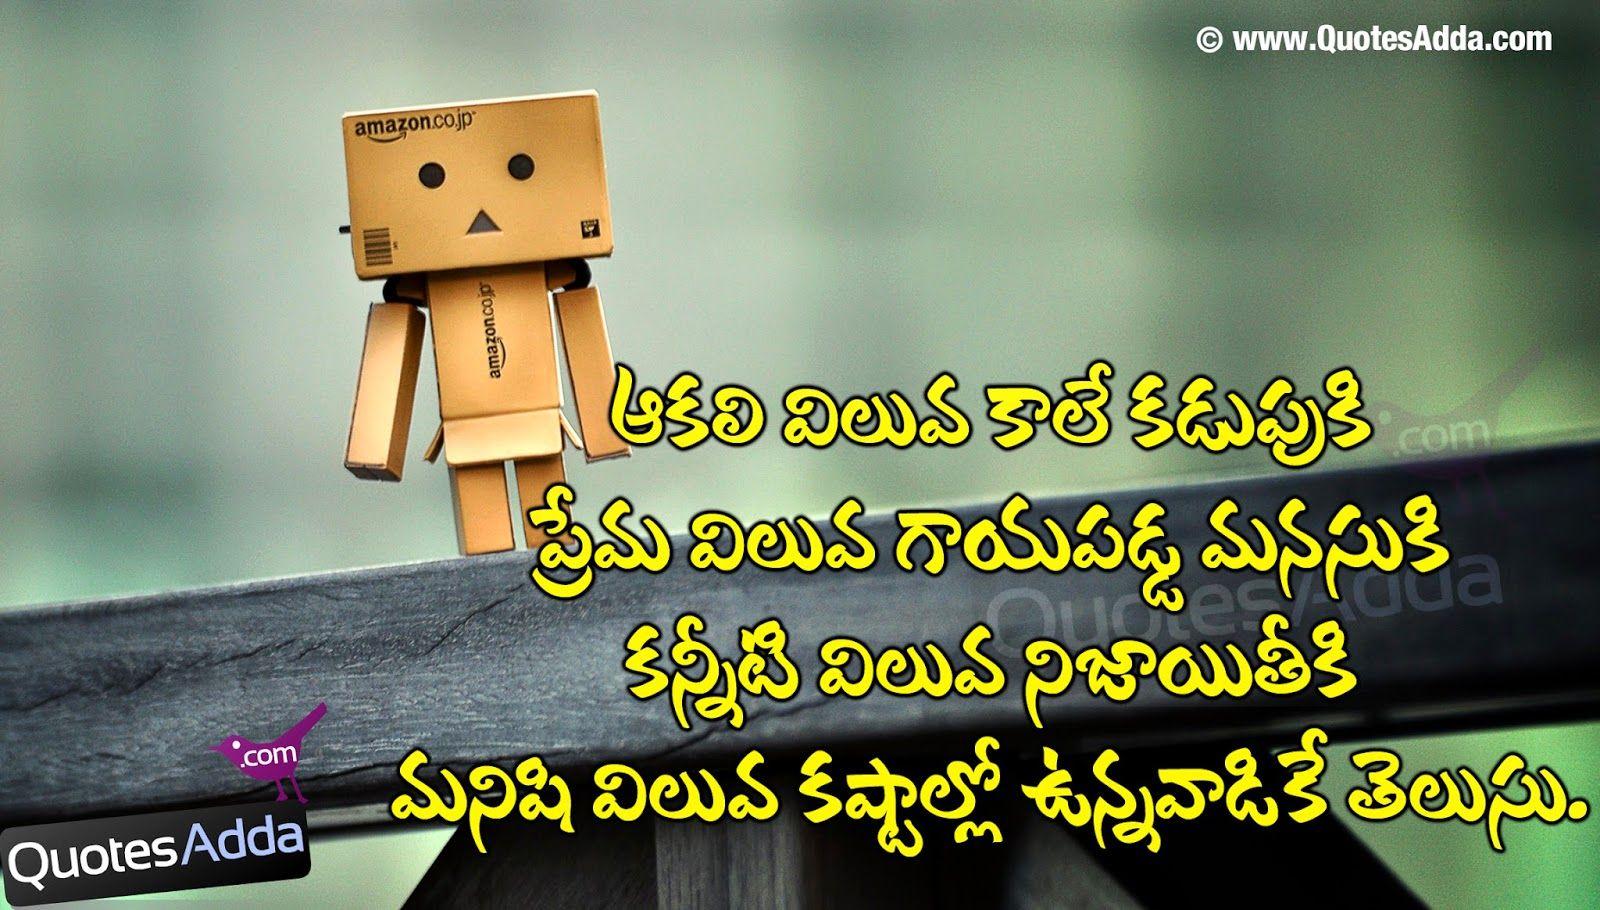 Telugu Alone Life Quotations Wallpapers Quotes Adda Com